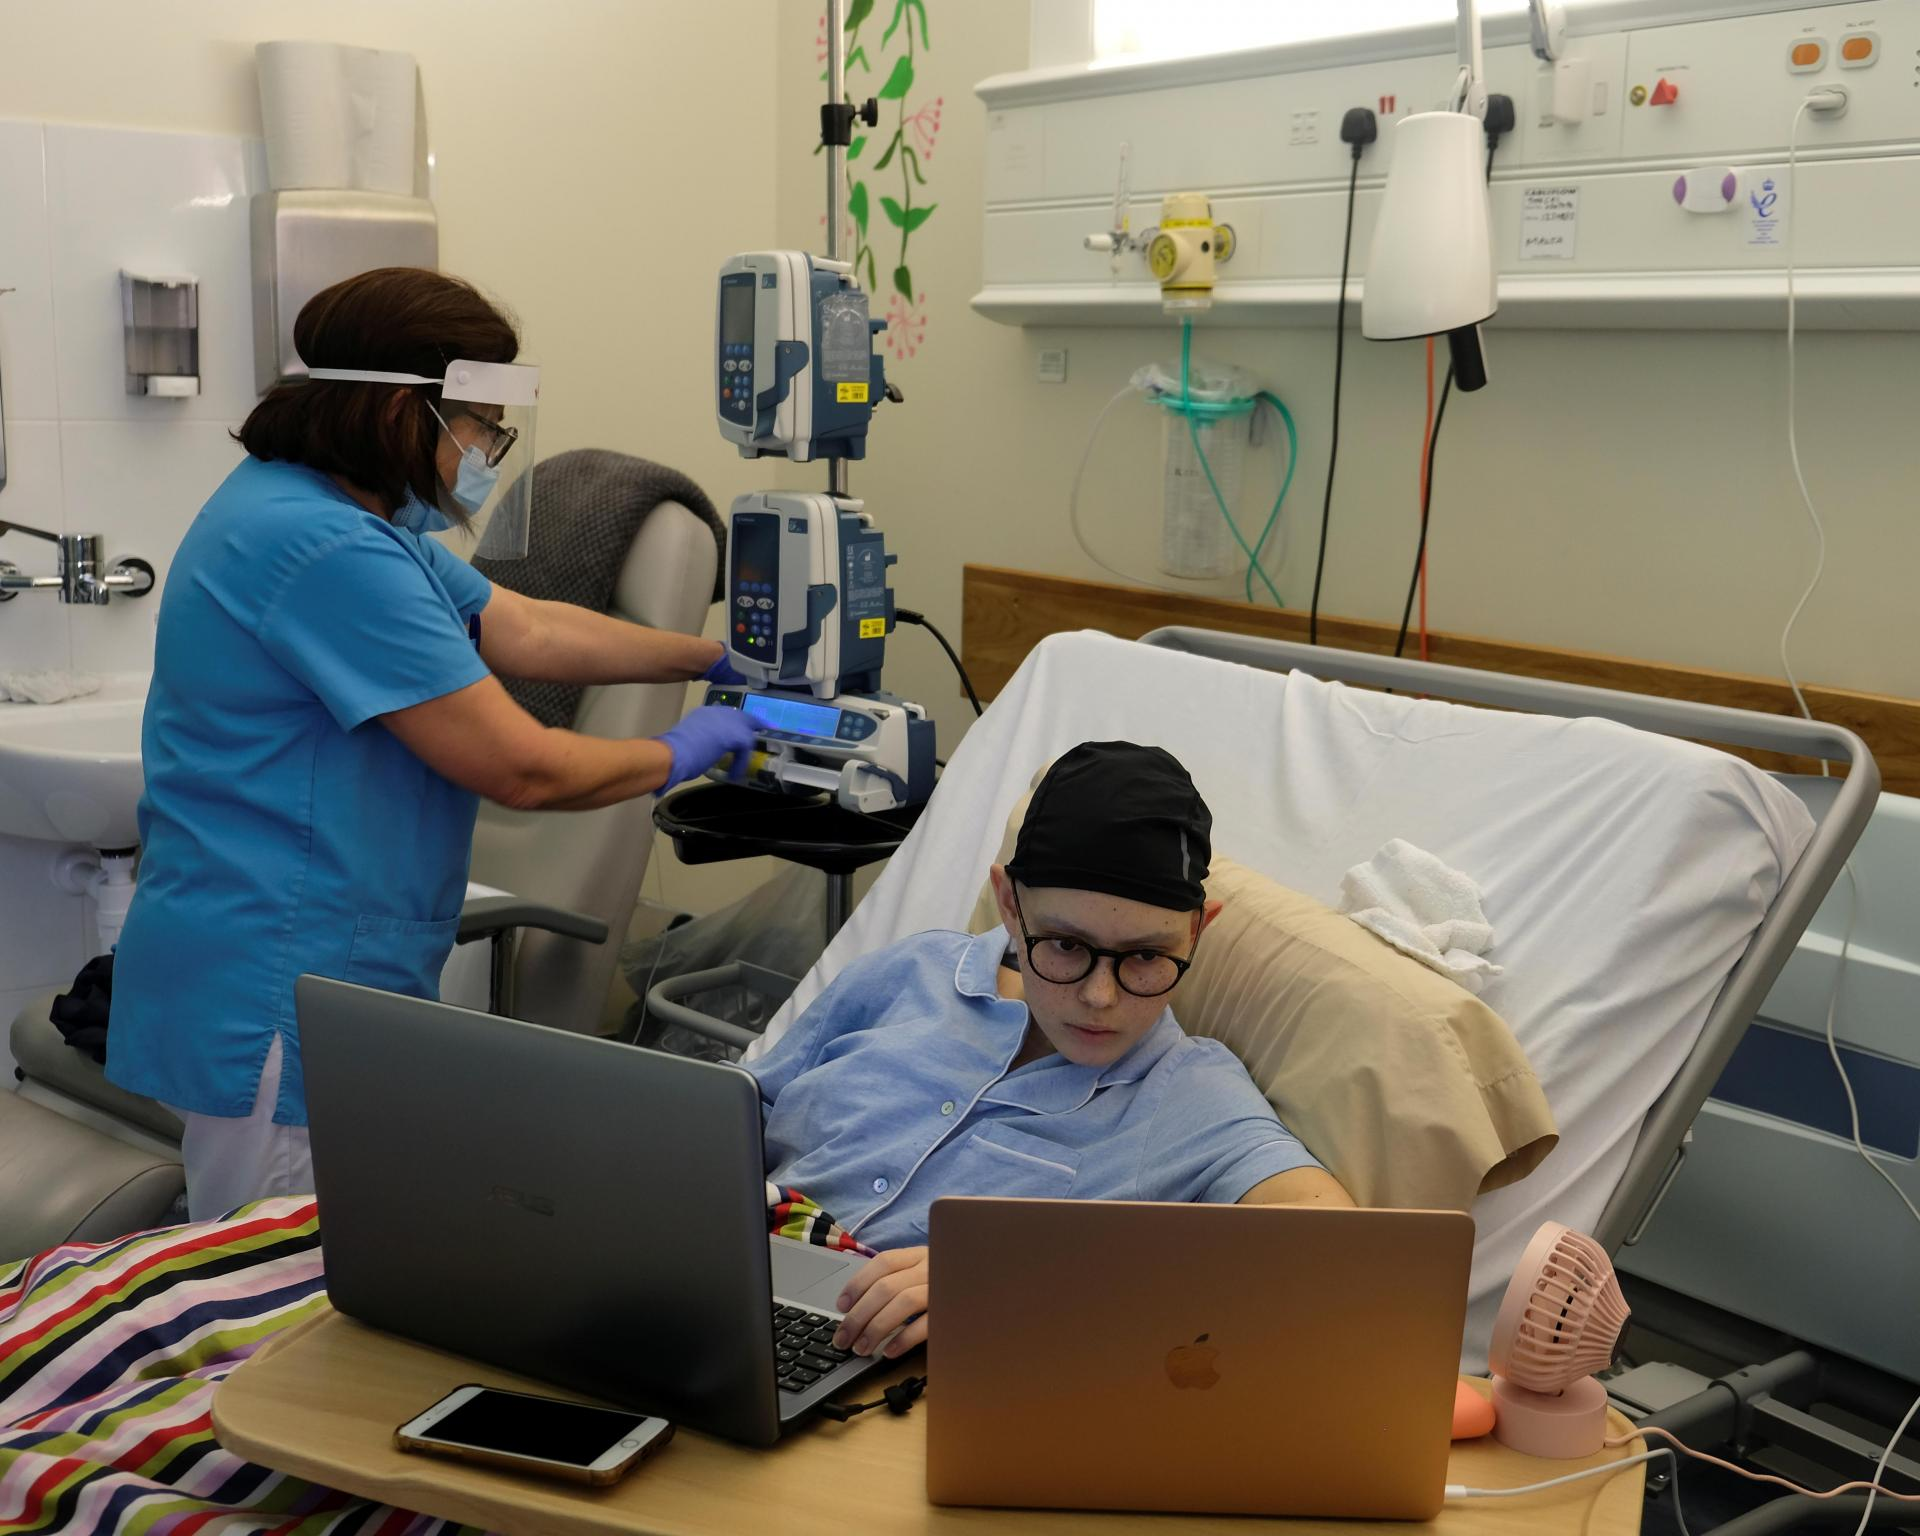 Rebecca Zammit Lupi at Mater Dei Hospital. Photo: Darrin Zammit Lupi